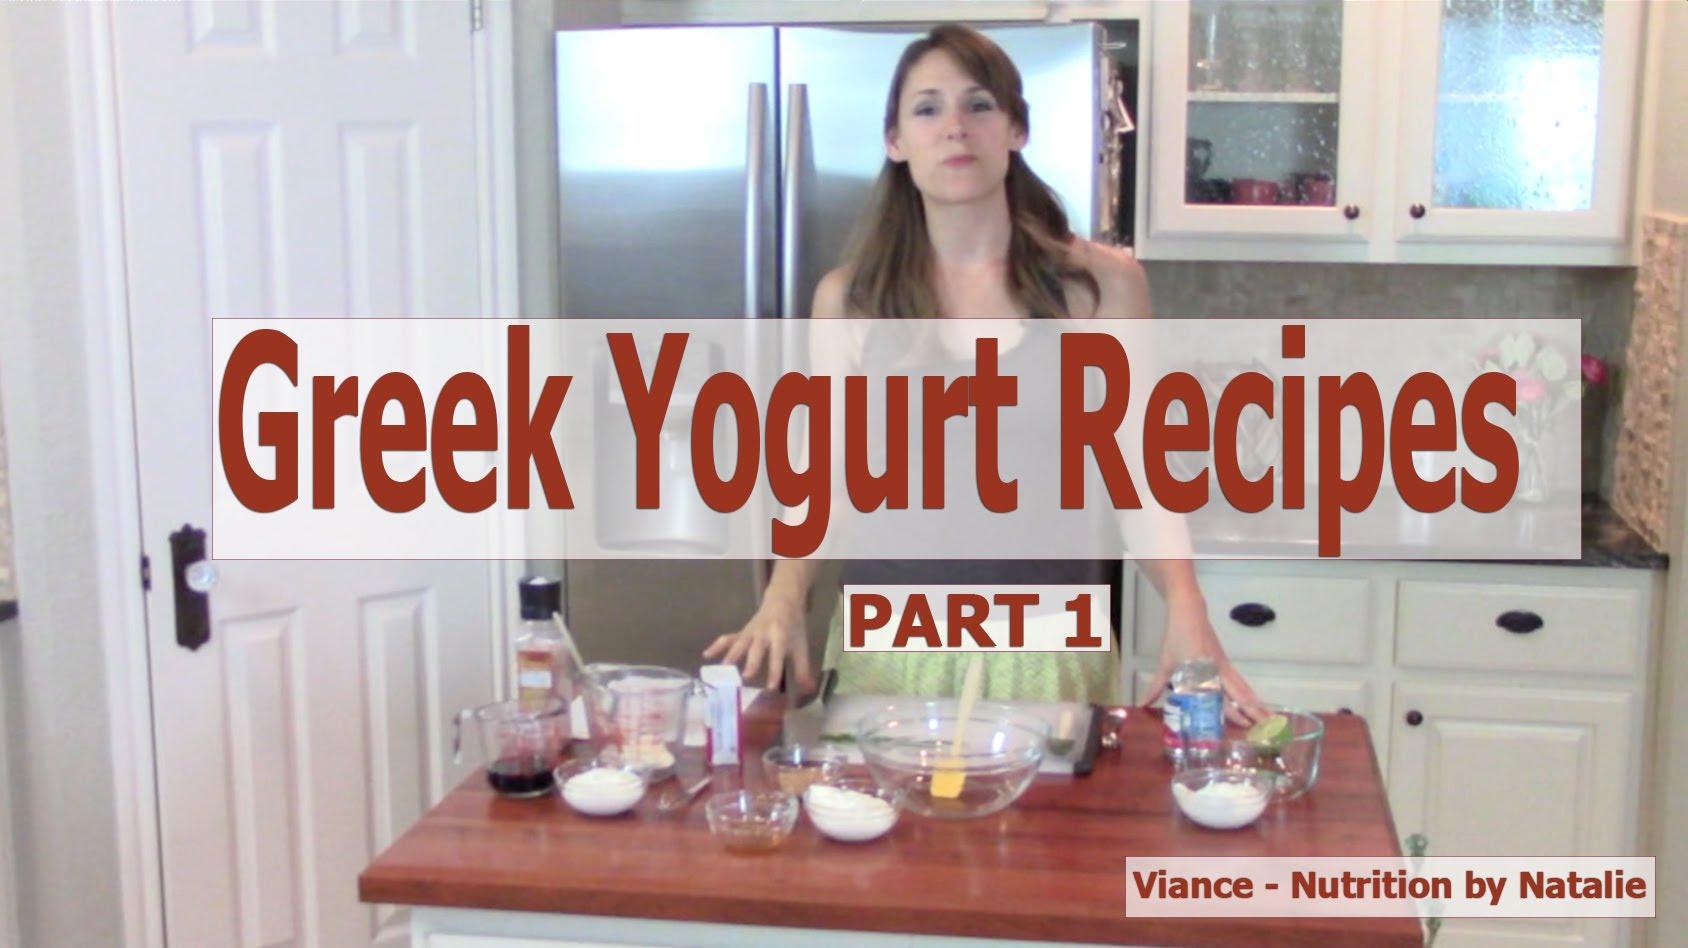 6 Delicious Recipes Using Greek Yogurt - Part 1